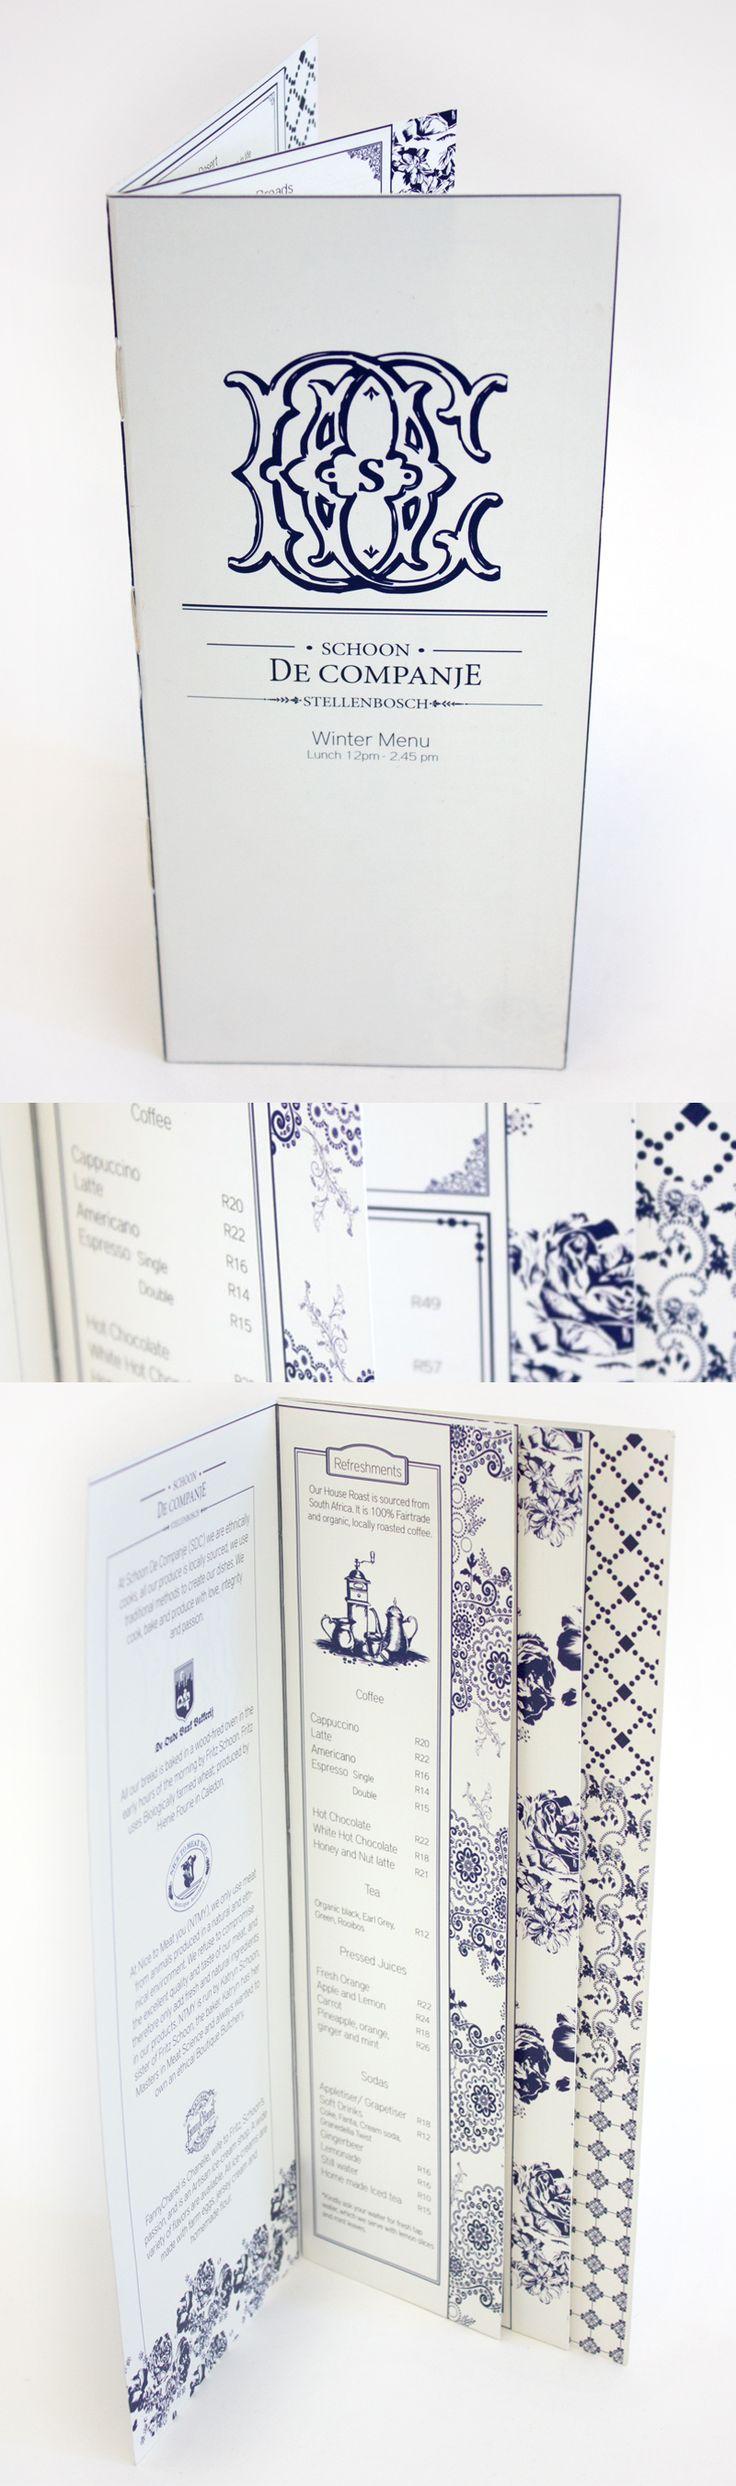 Class: 1 Year Print Design & Publishing || Name: Carlin van Zyl || Year: 2014 || Recreate your favorite restaurants menu. http://friendsofdesign.net/1-year-print-design-publishing